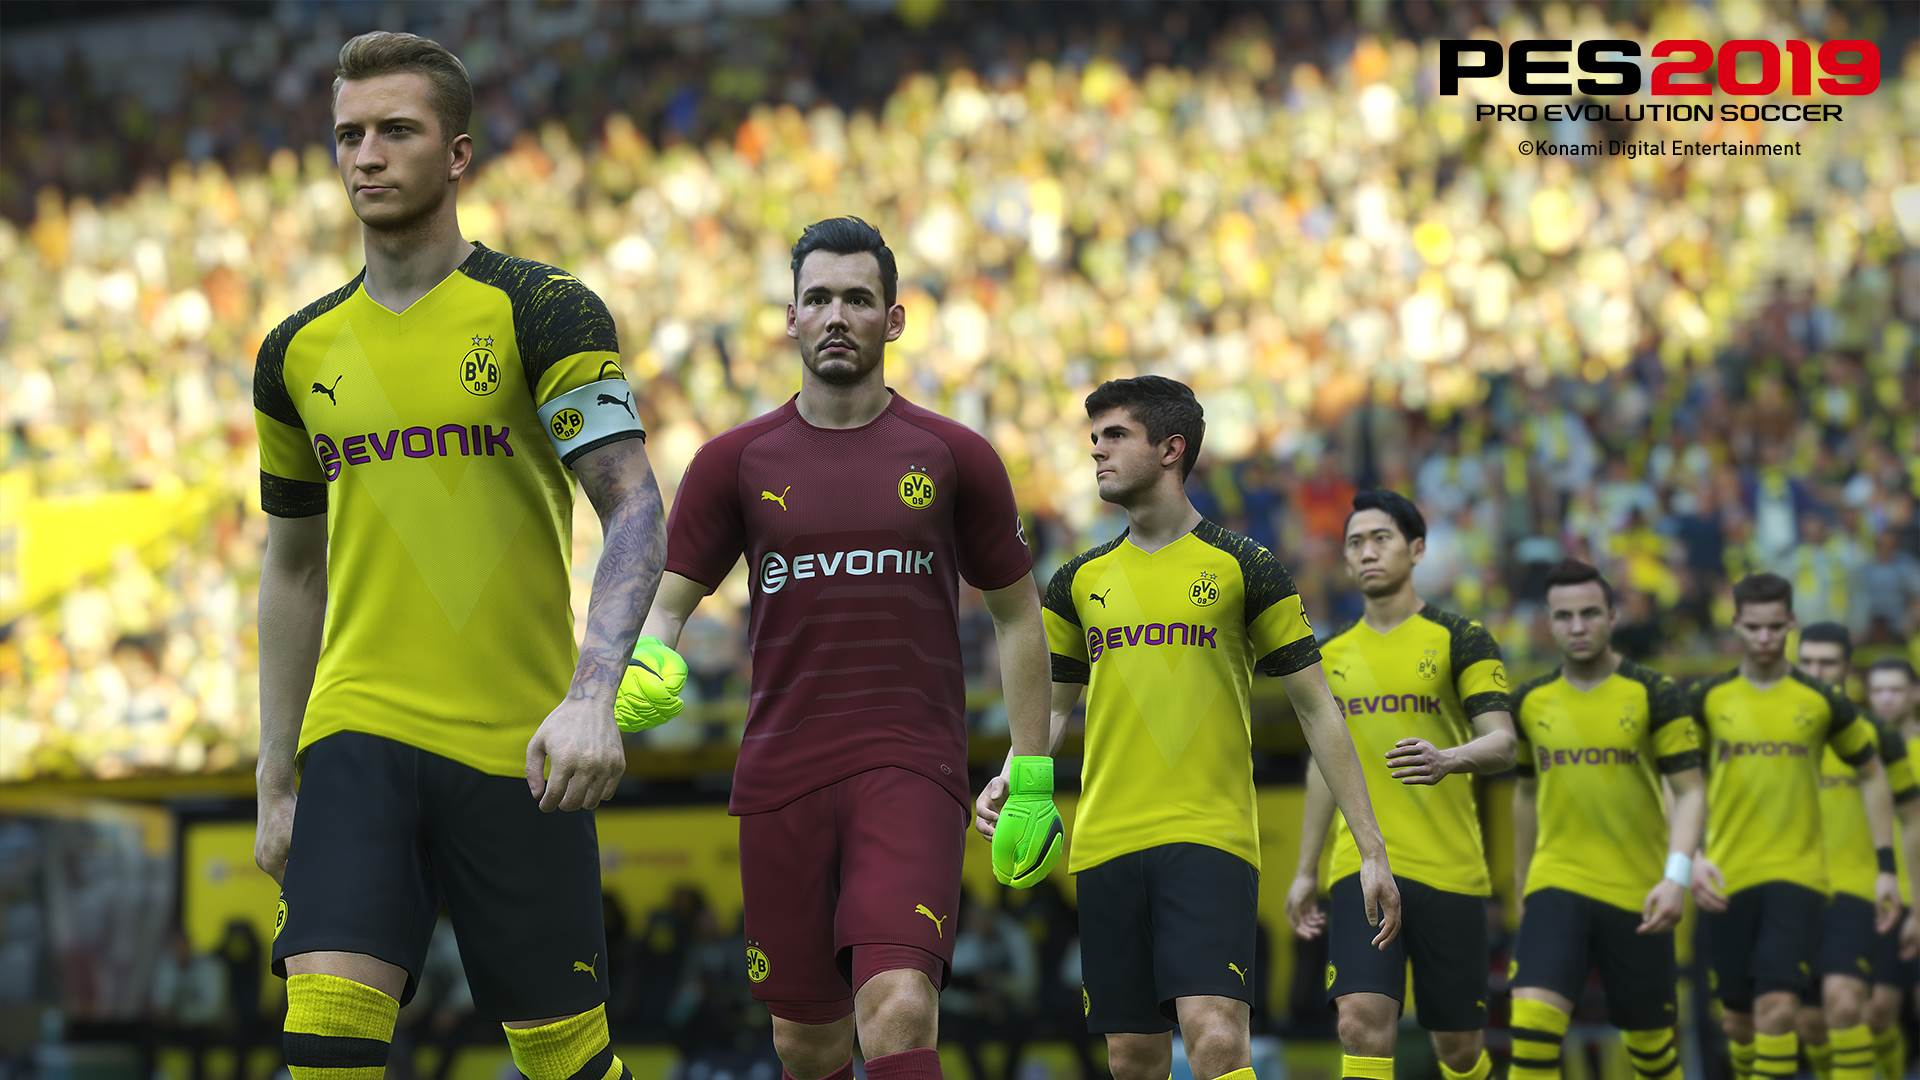 PES 2019 prvi gameplay: Francuska-Argentina VIDEO